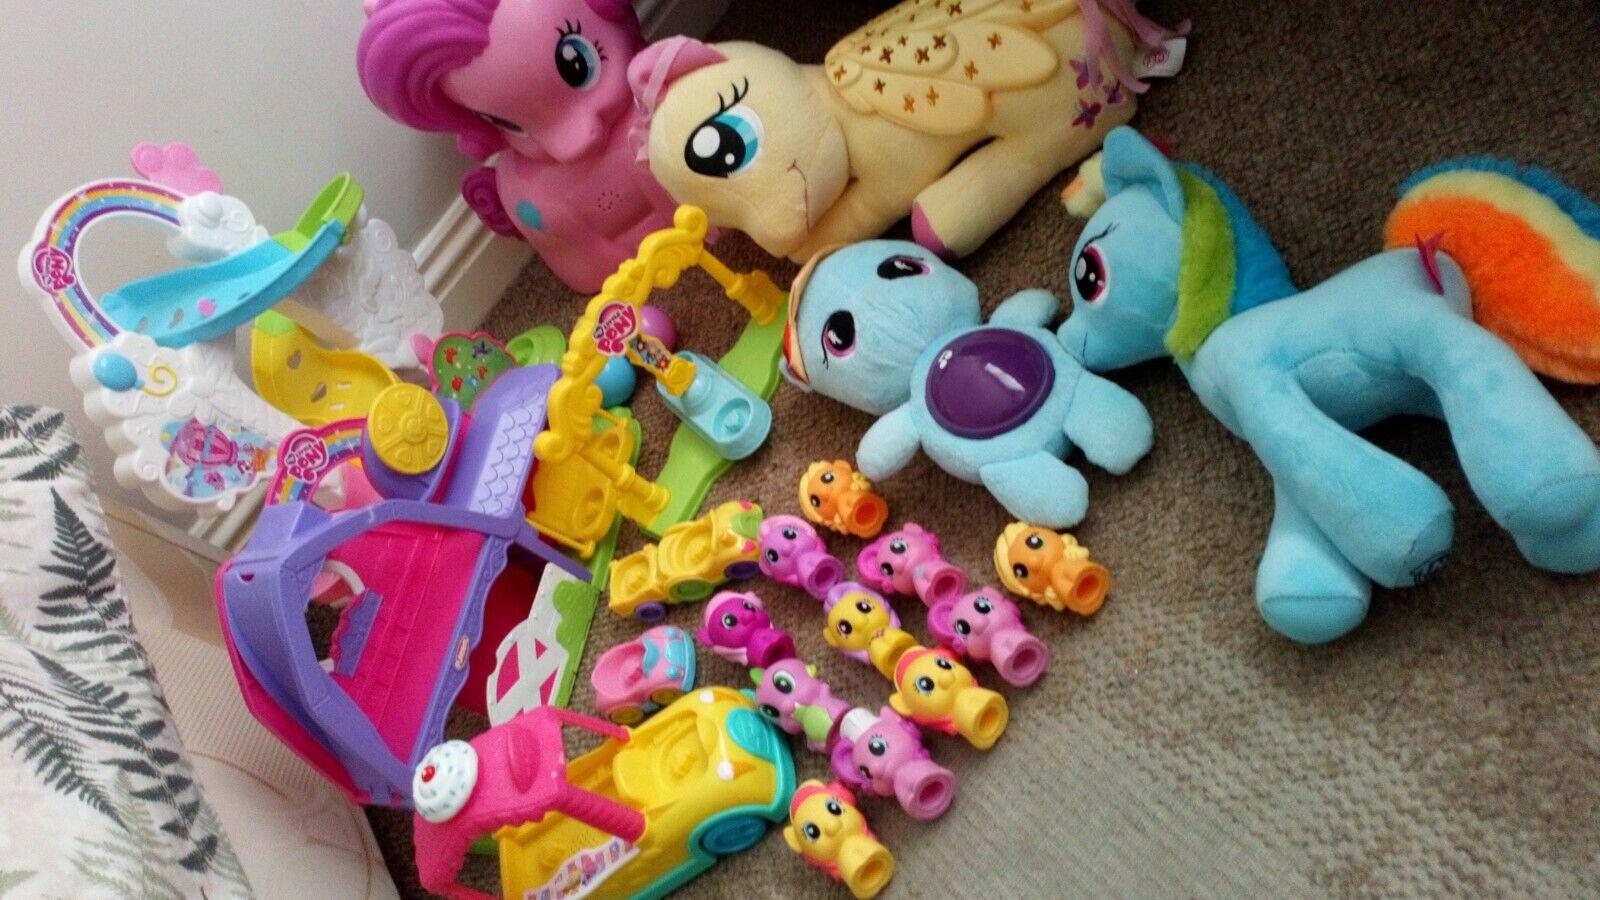 Jugarskool First My Little Pony Bundle pkus light up fluttershy night time Dash